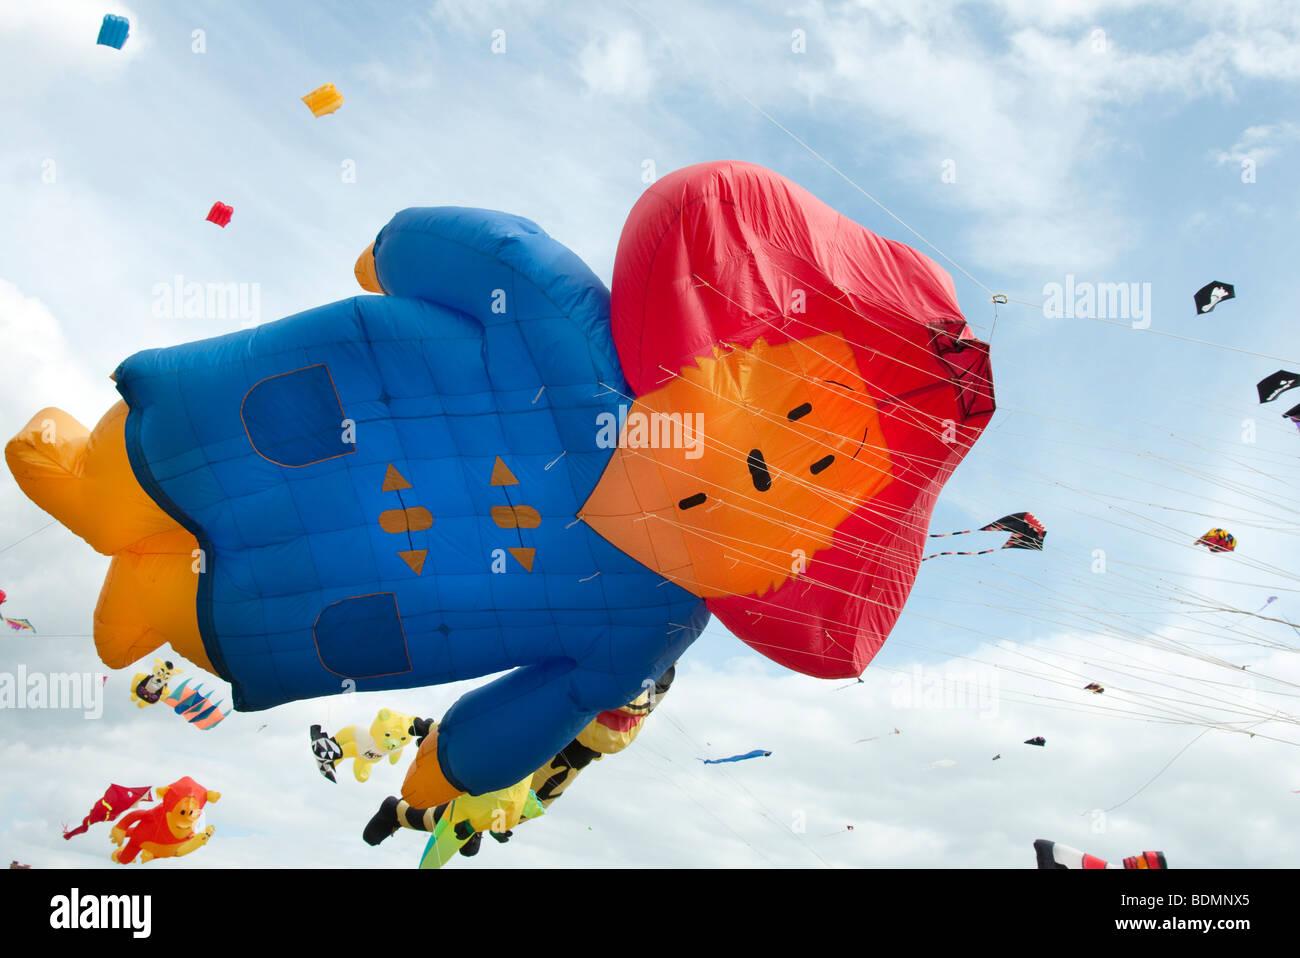 kites flying at a kite festival - Stock Image